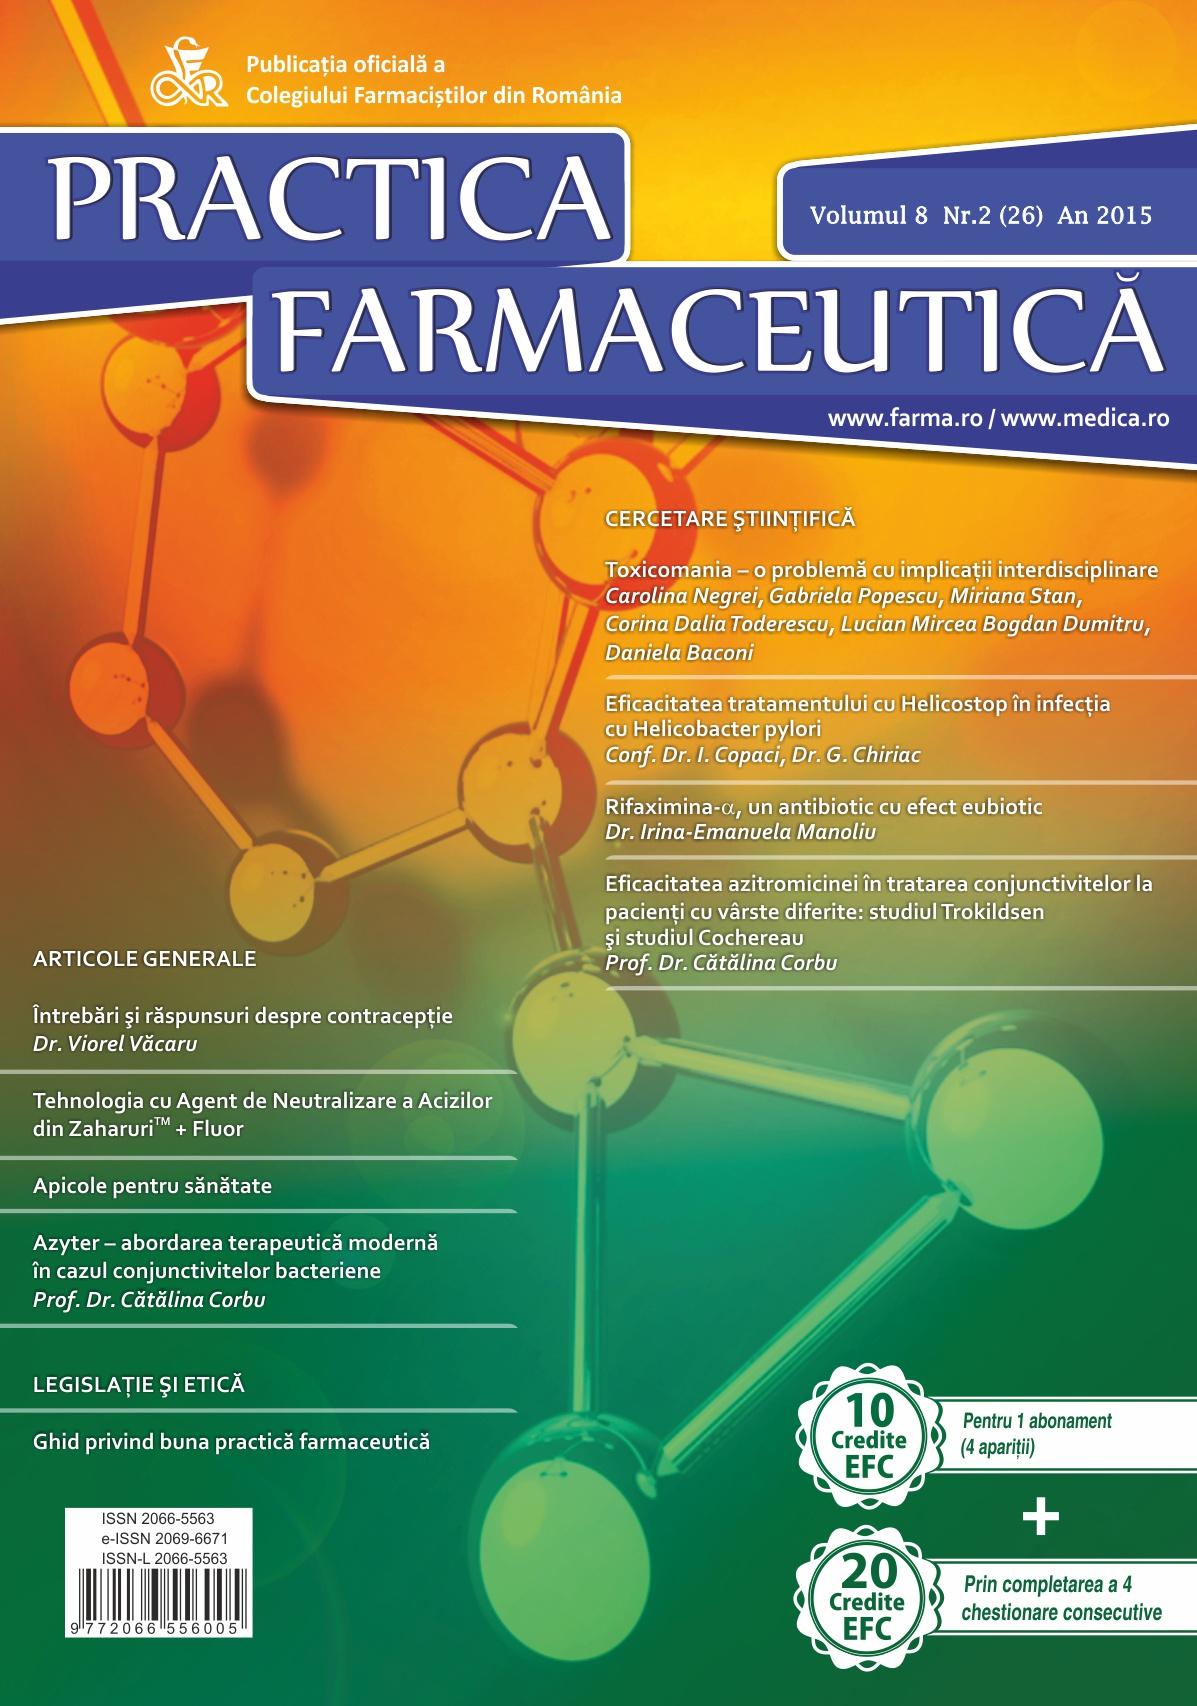 Revista Practica Farmaceutica, Vol. VIII, No. 2 (26), 2015